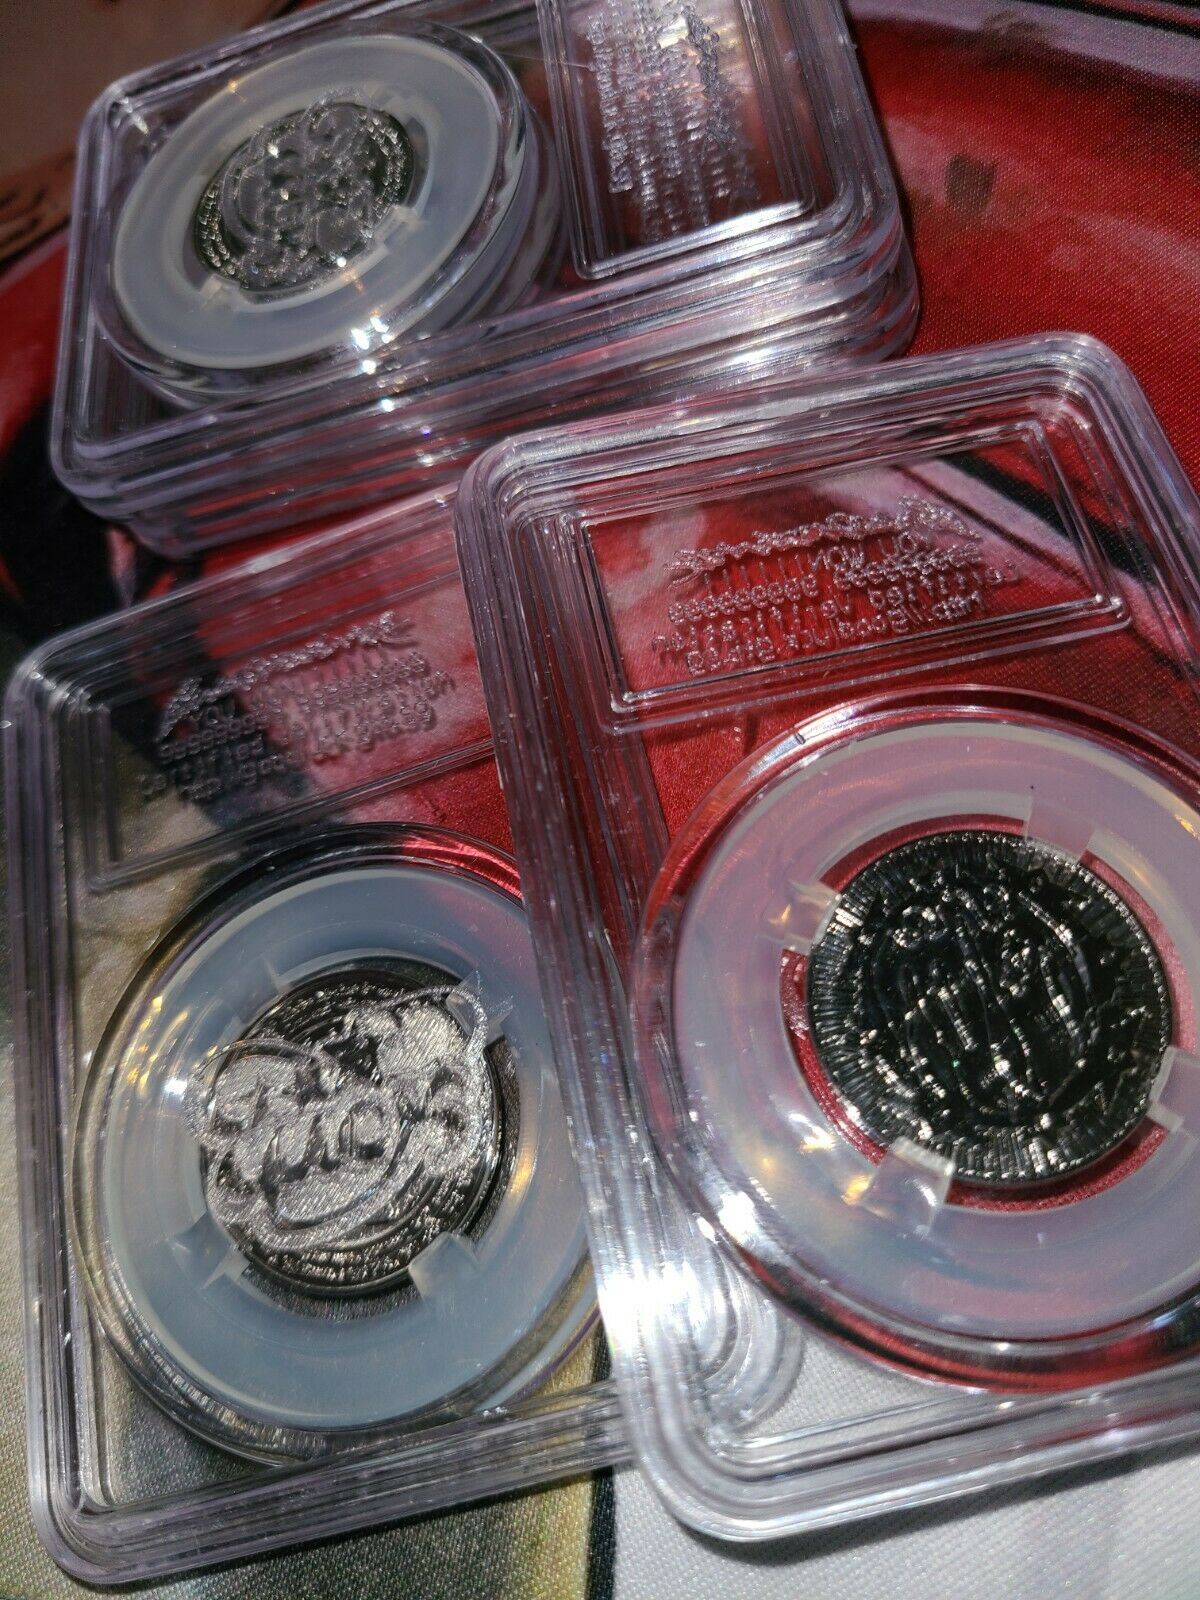 Bladee x Mechatok Good Luck Coin 💯😭 Drain Gang (Silver) 1X WITH SCRATCH TICKET